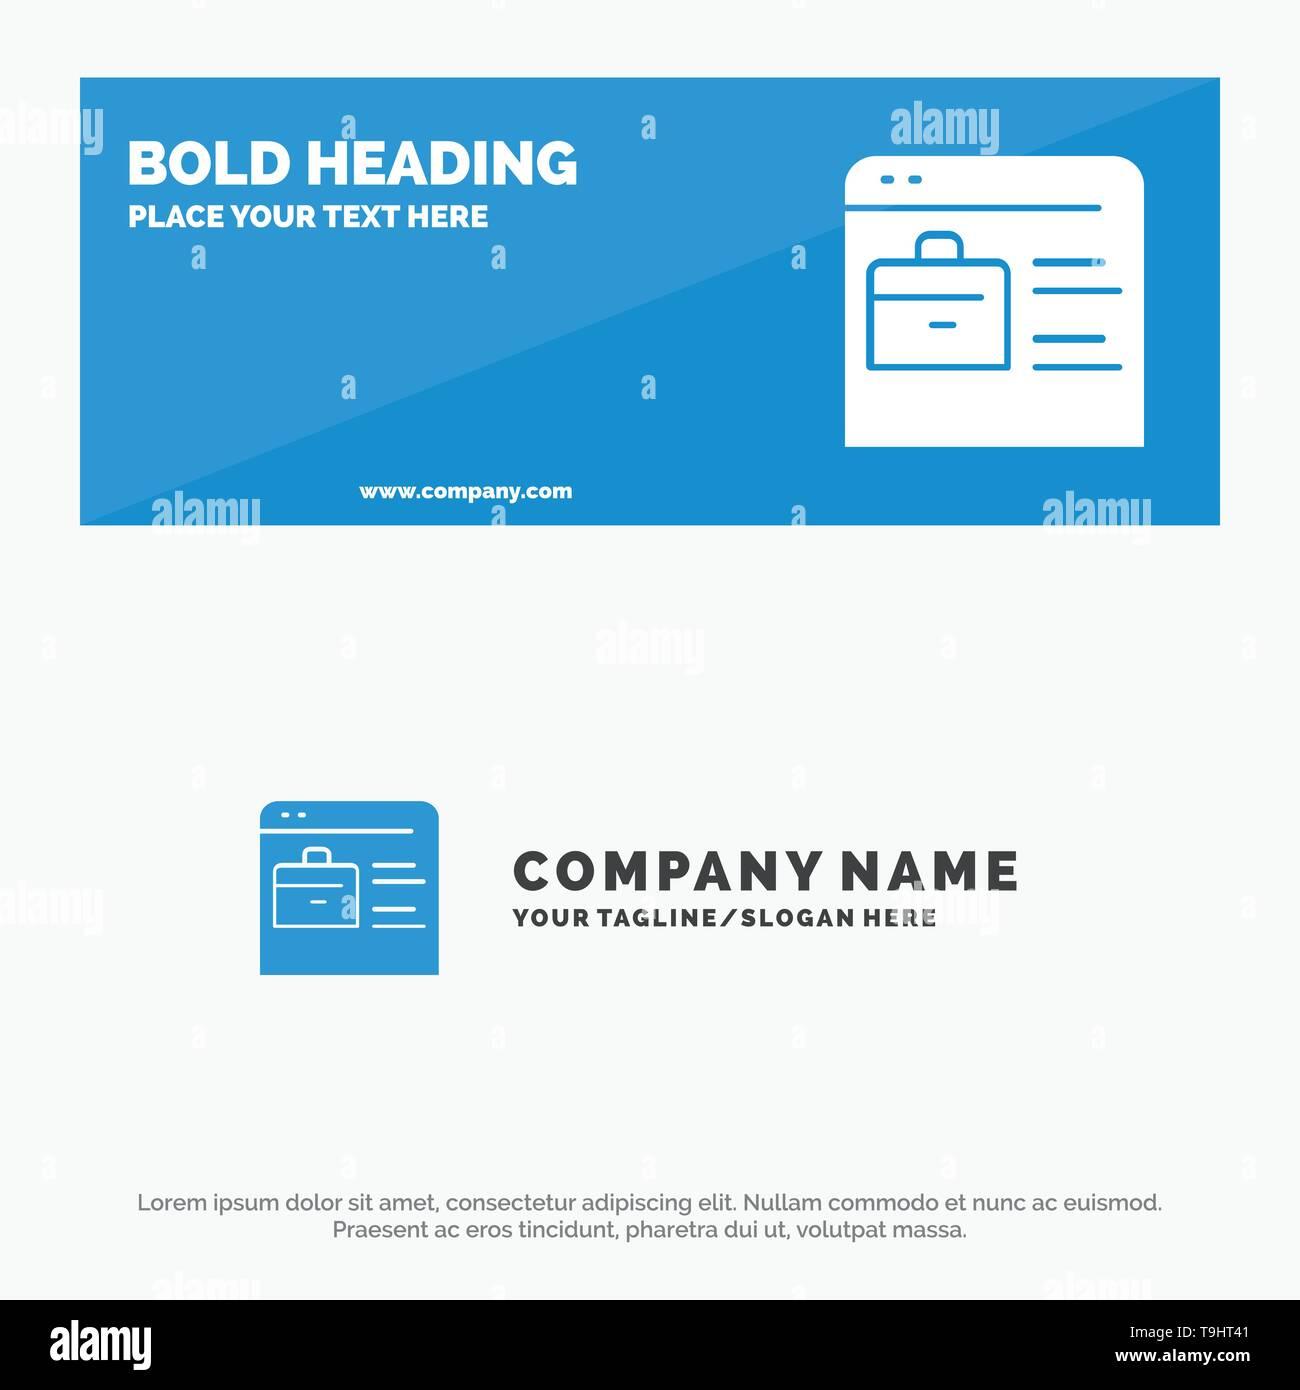 Bag Find Job Job Website Online Portfolio Solid Icon Website Banner And Business Logo Template Stock Vector Art Illustration Vector Image 246869169 Alamy